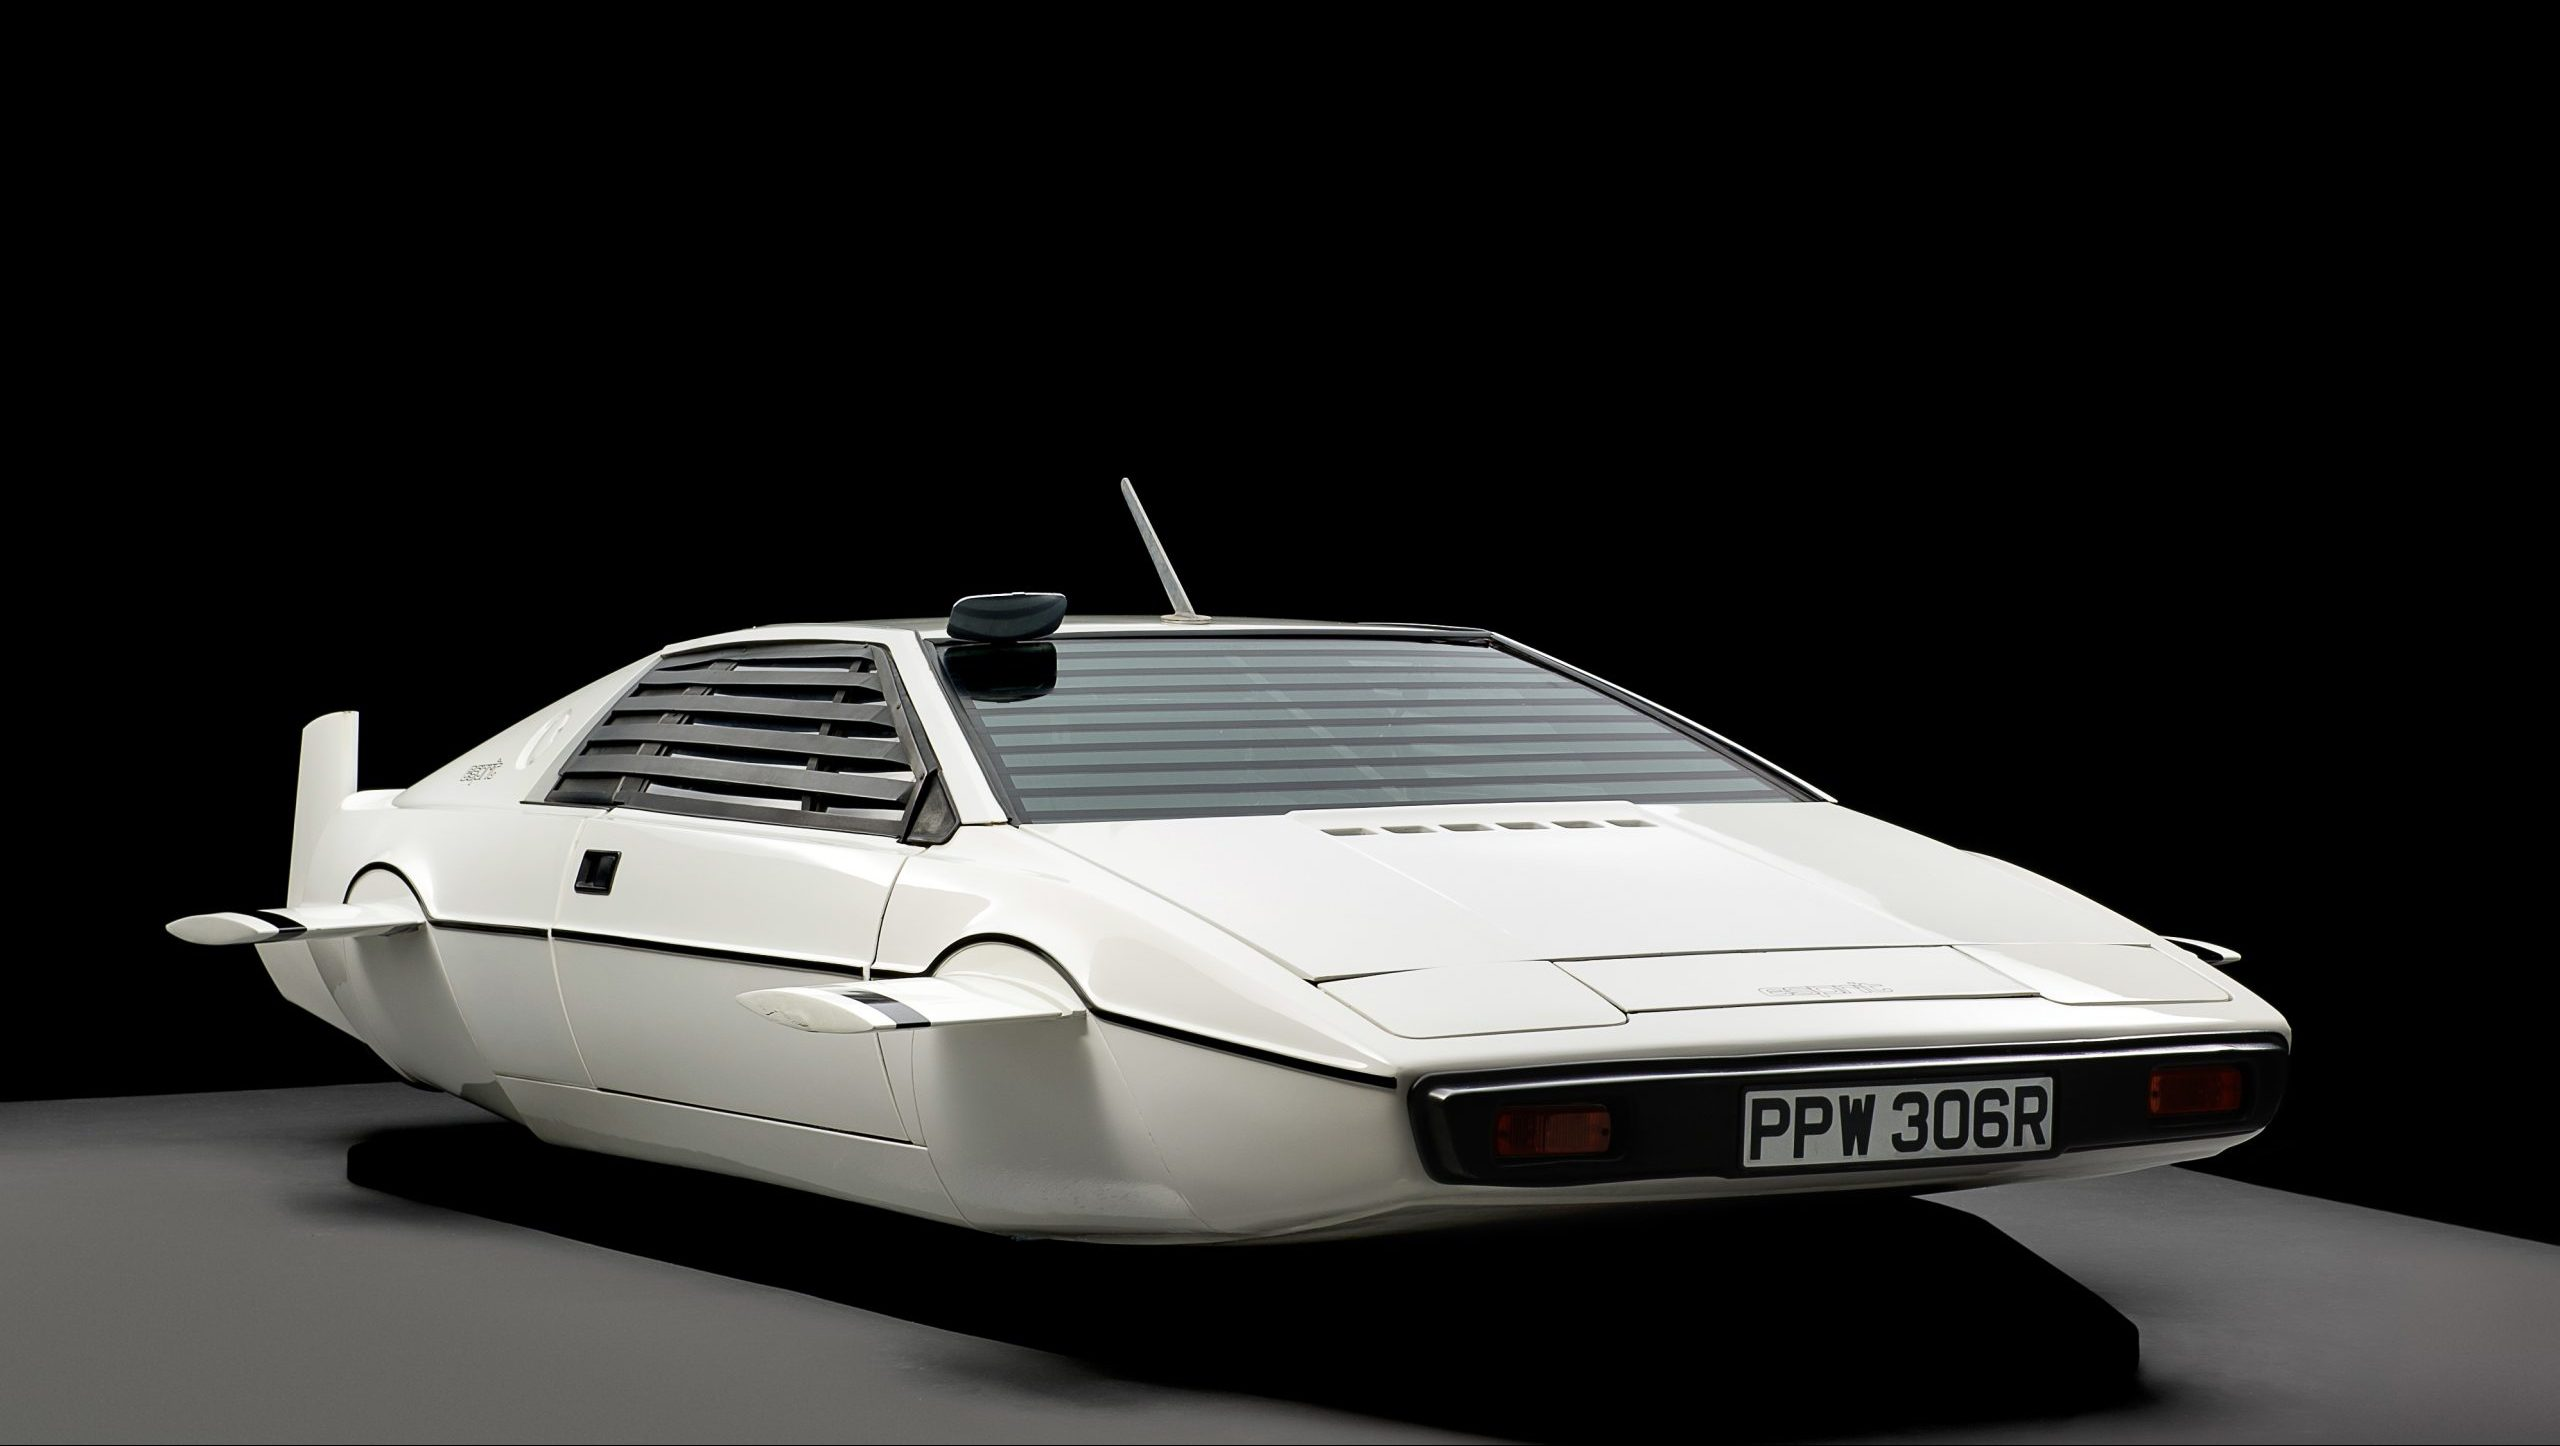 The Midas Touch: The true value of a James Bond car